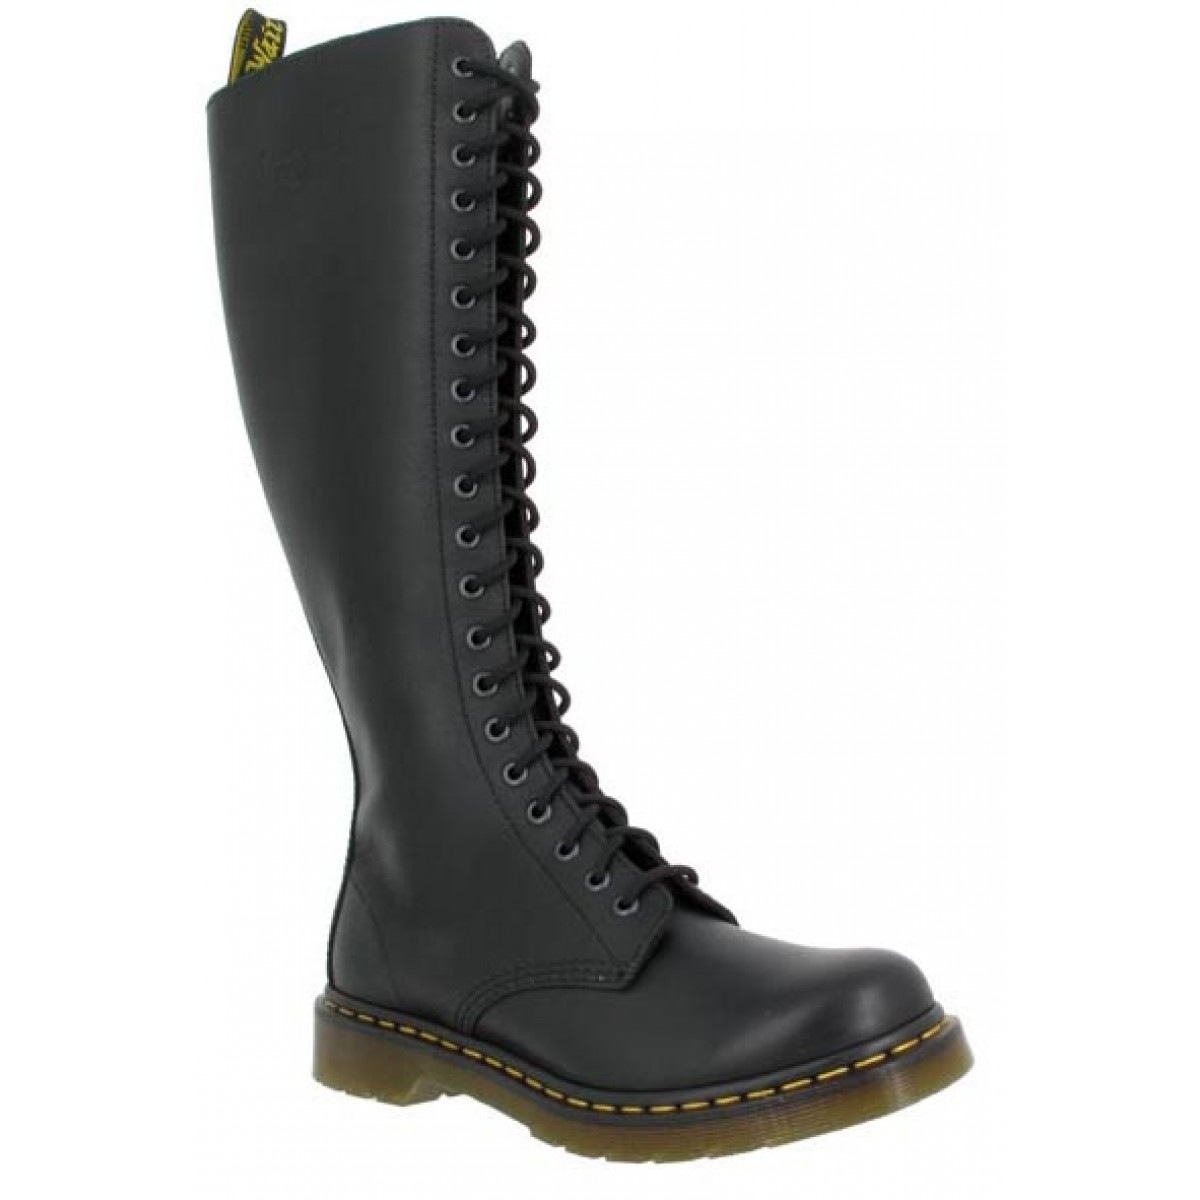 Bottes Dr MARTENS Zip Boot 20 Box Femme Noir